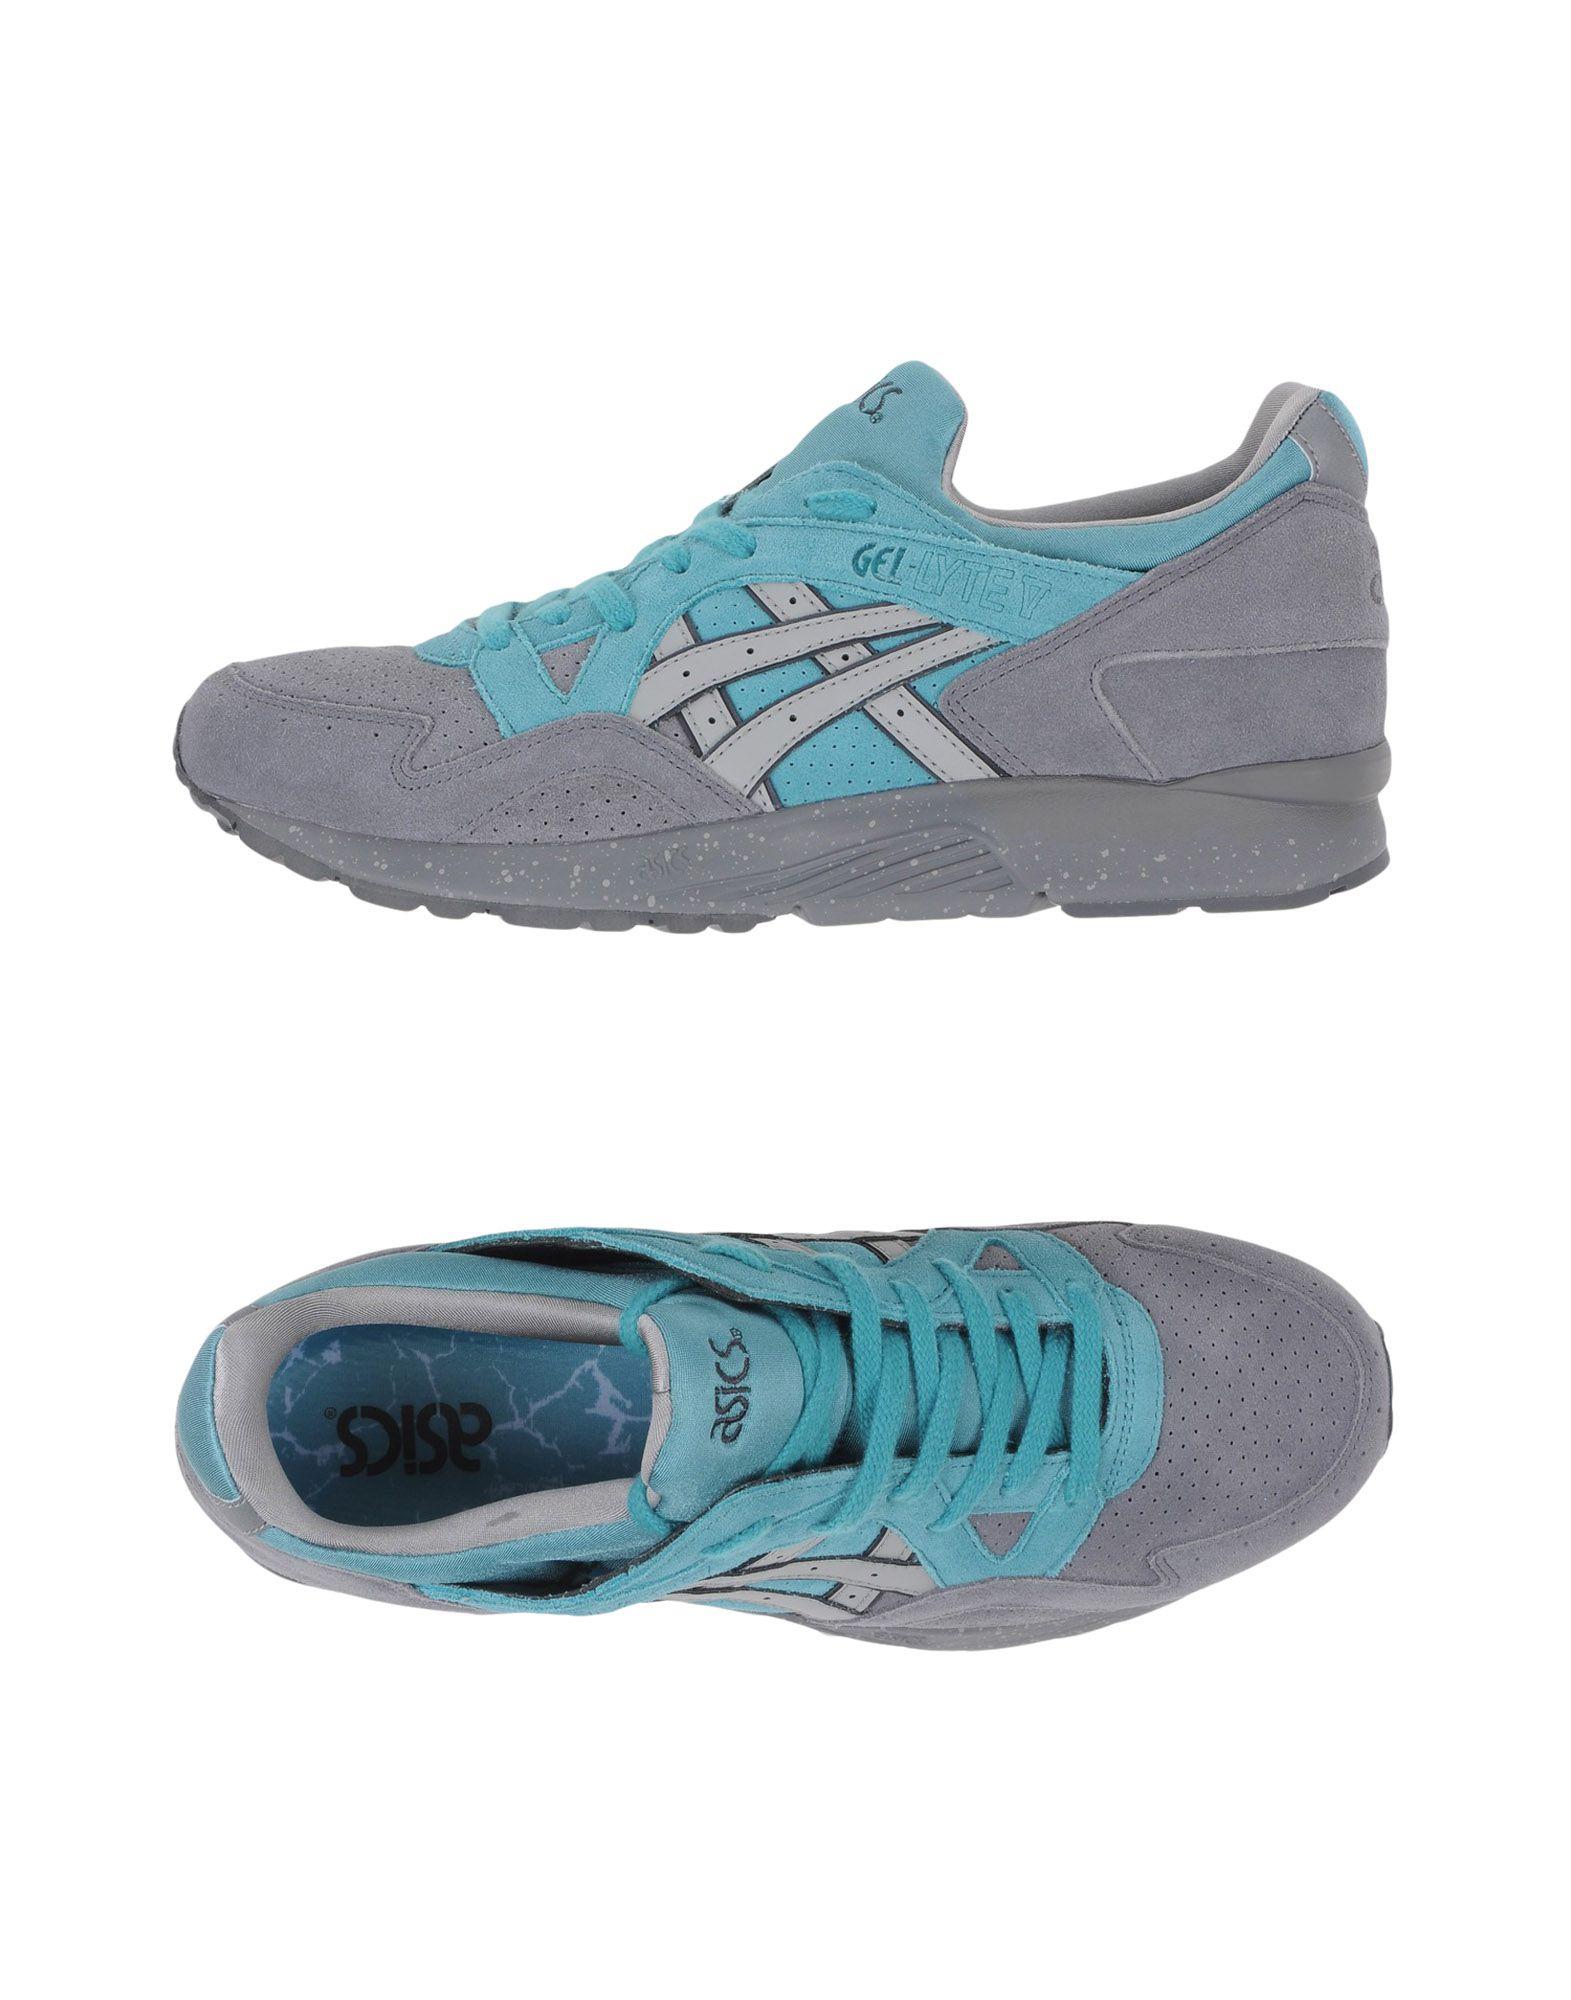 ASICS TIGER Herren Low Sneakers & Tennisschuhe Farbe Grau Größe 7